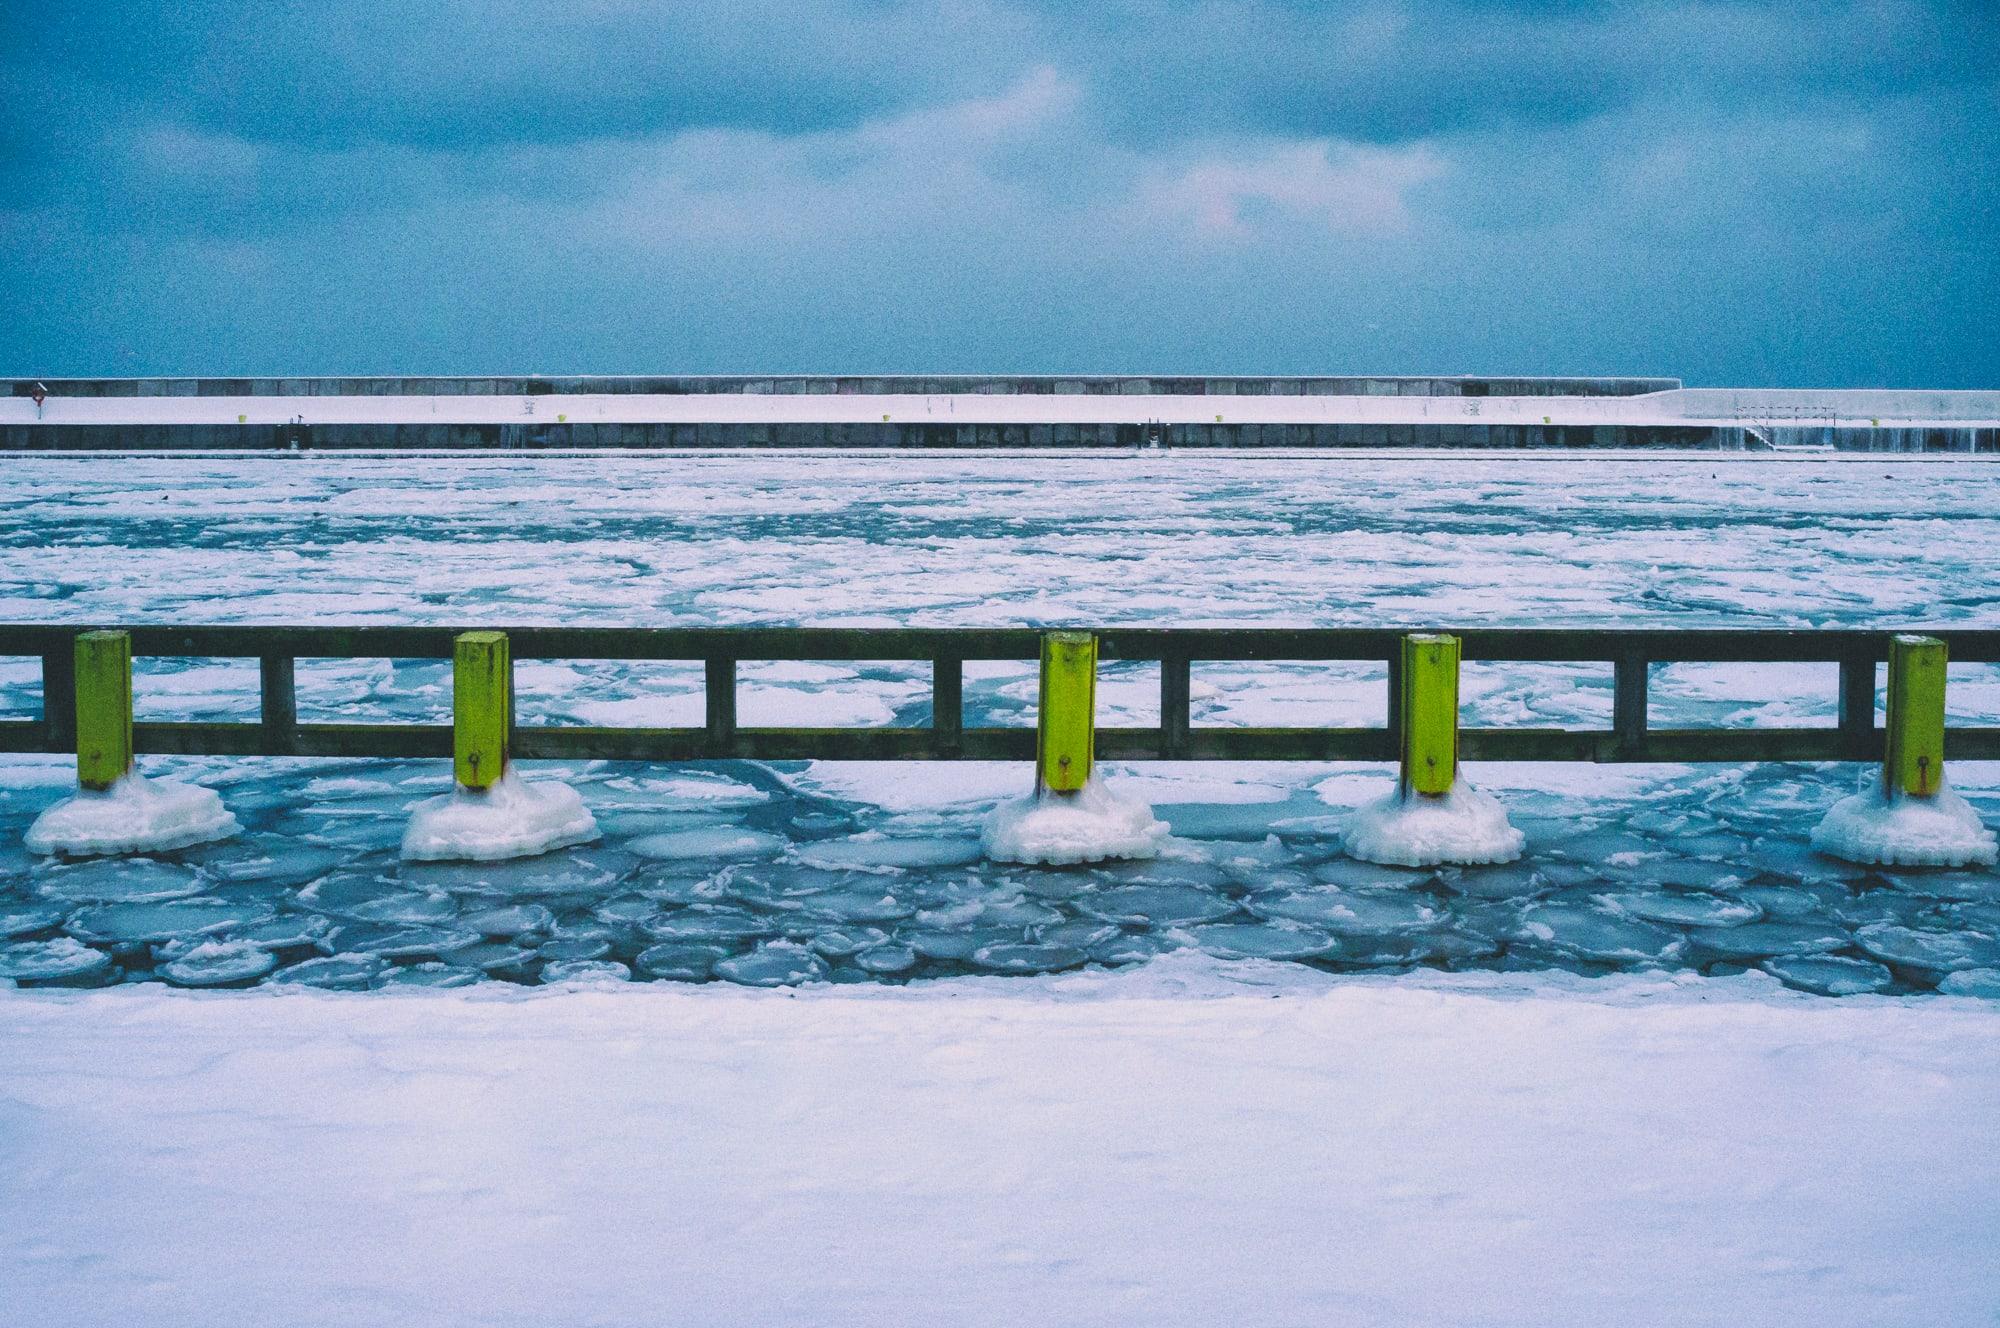 zima morze